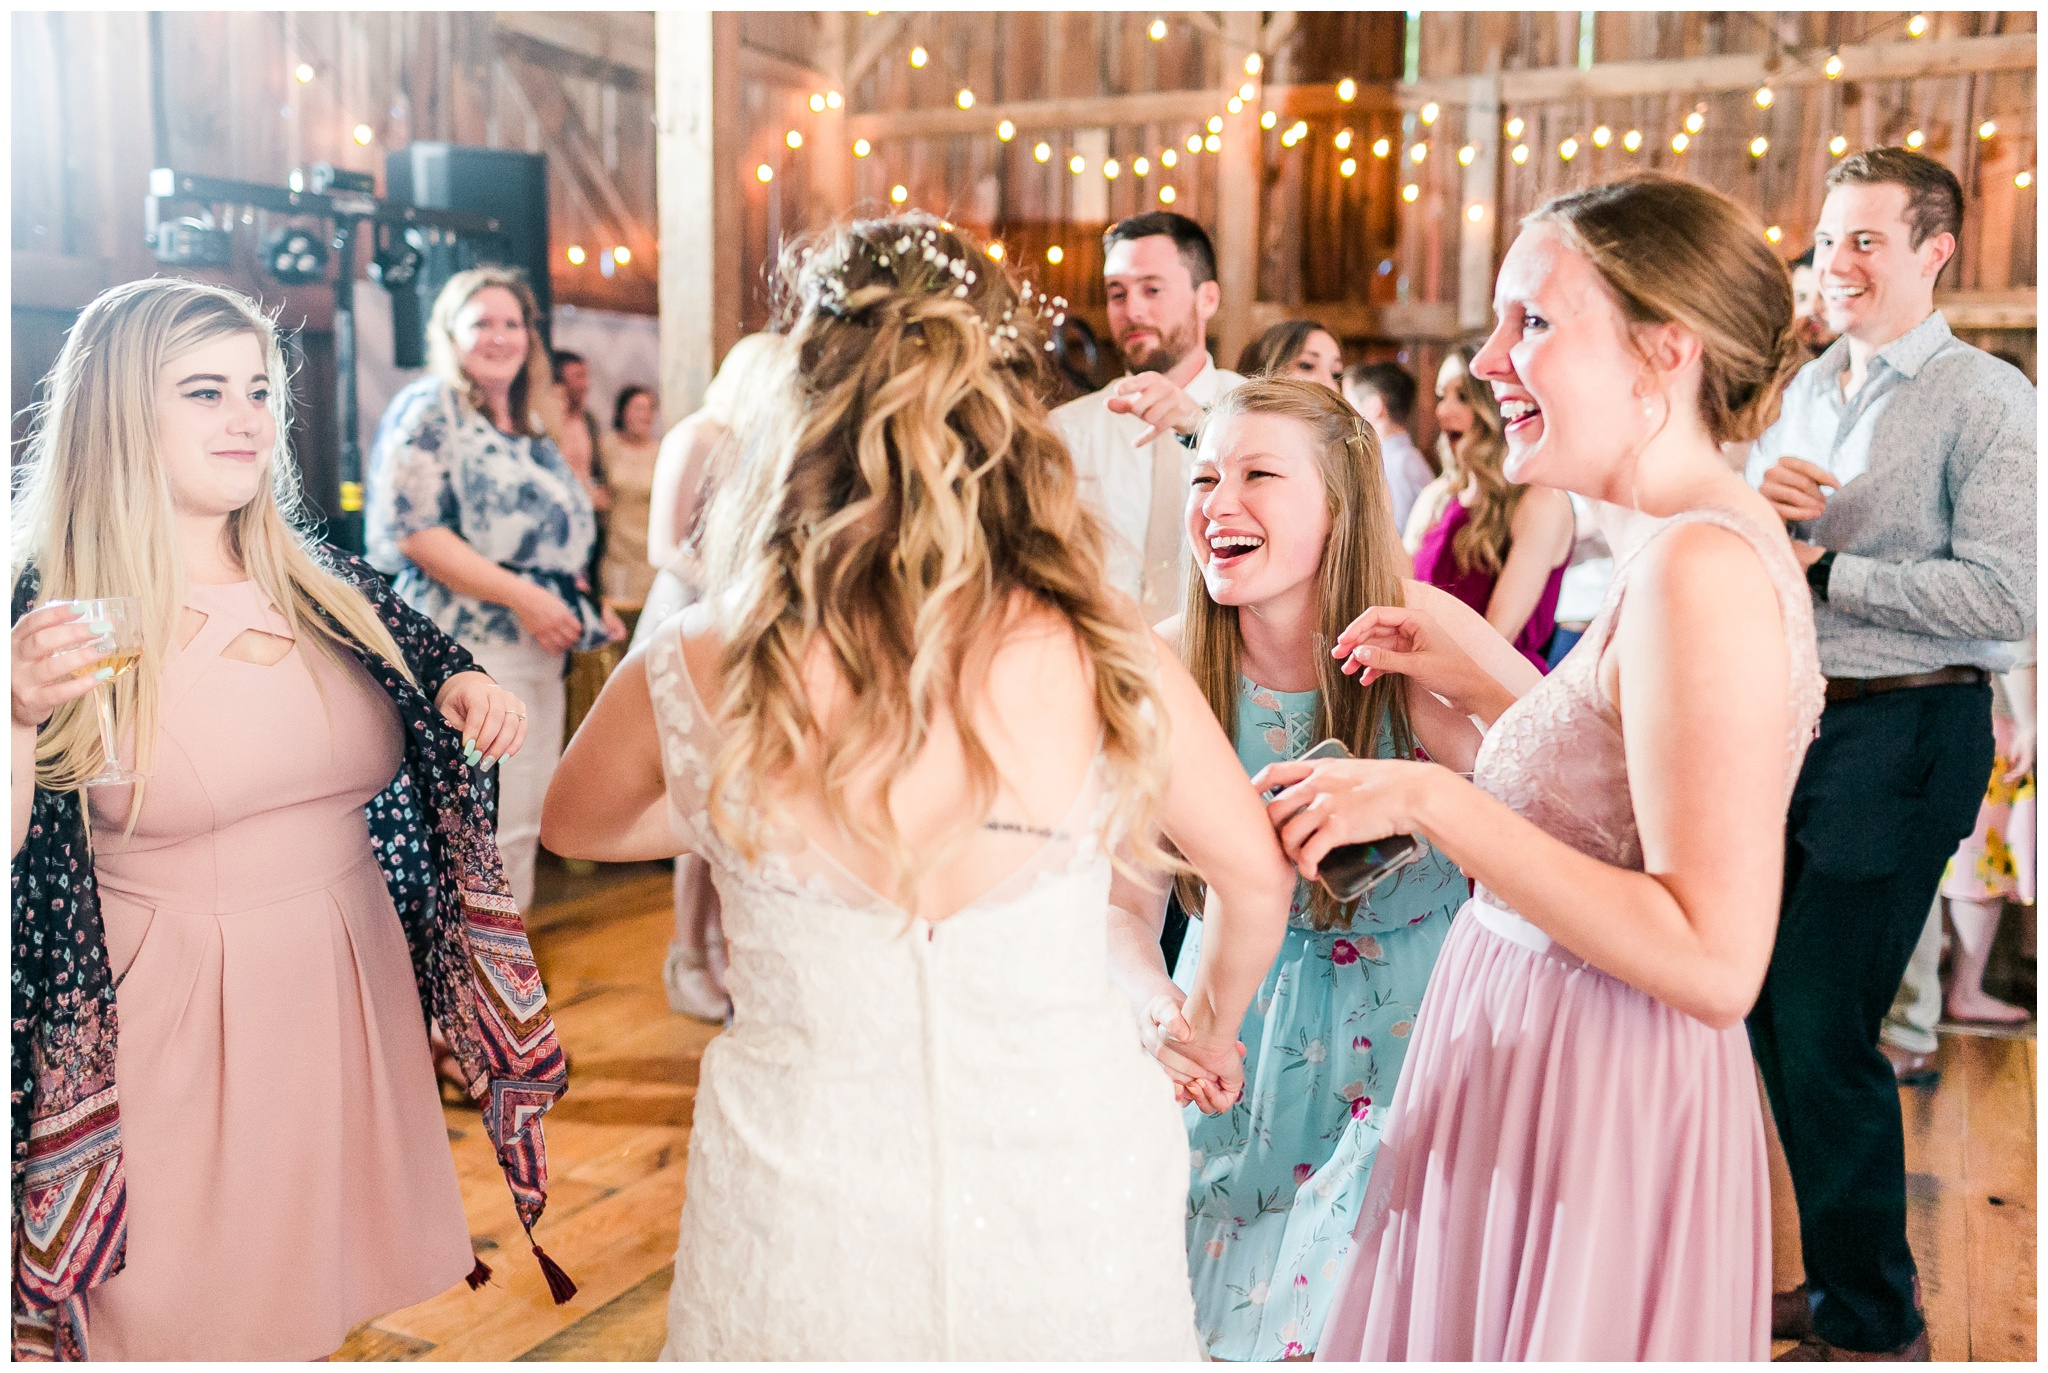 over_the_vines_wedding_edgerton_wisconsin_wedding_caynay_photo_4047.jpg